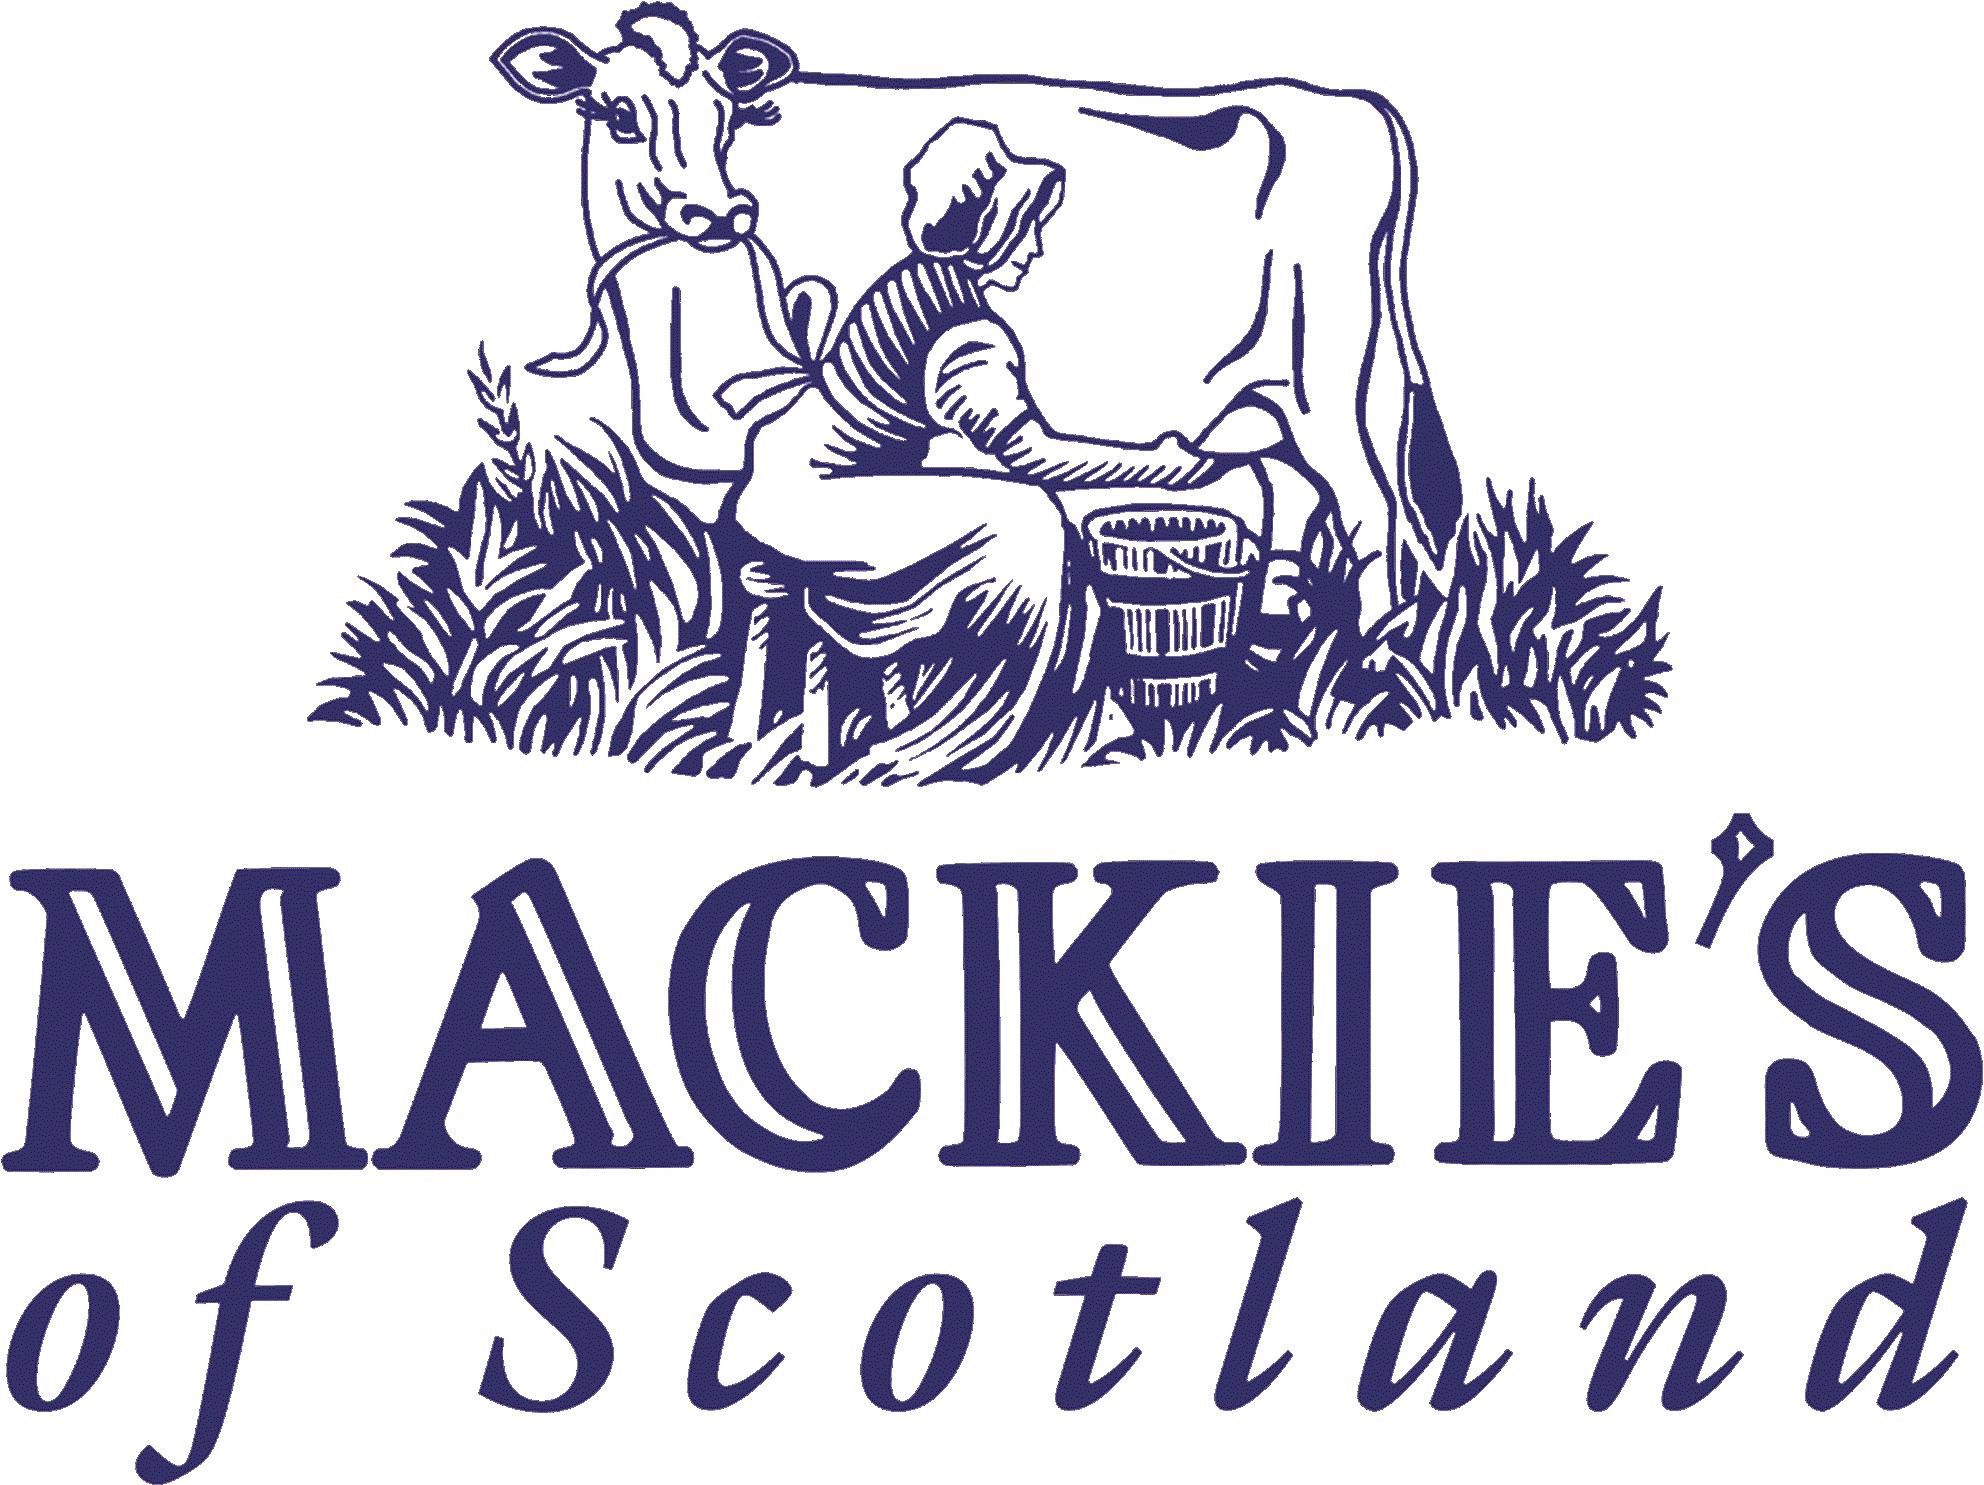 Mackie's of Scotland